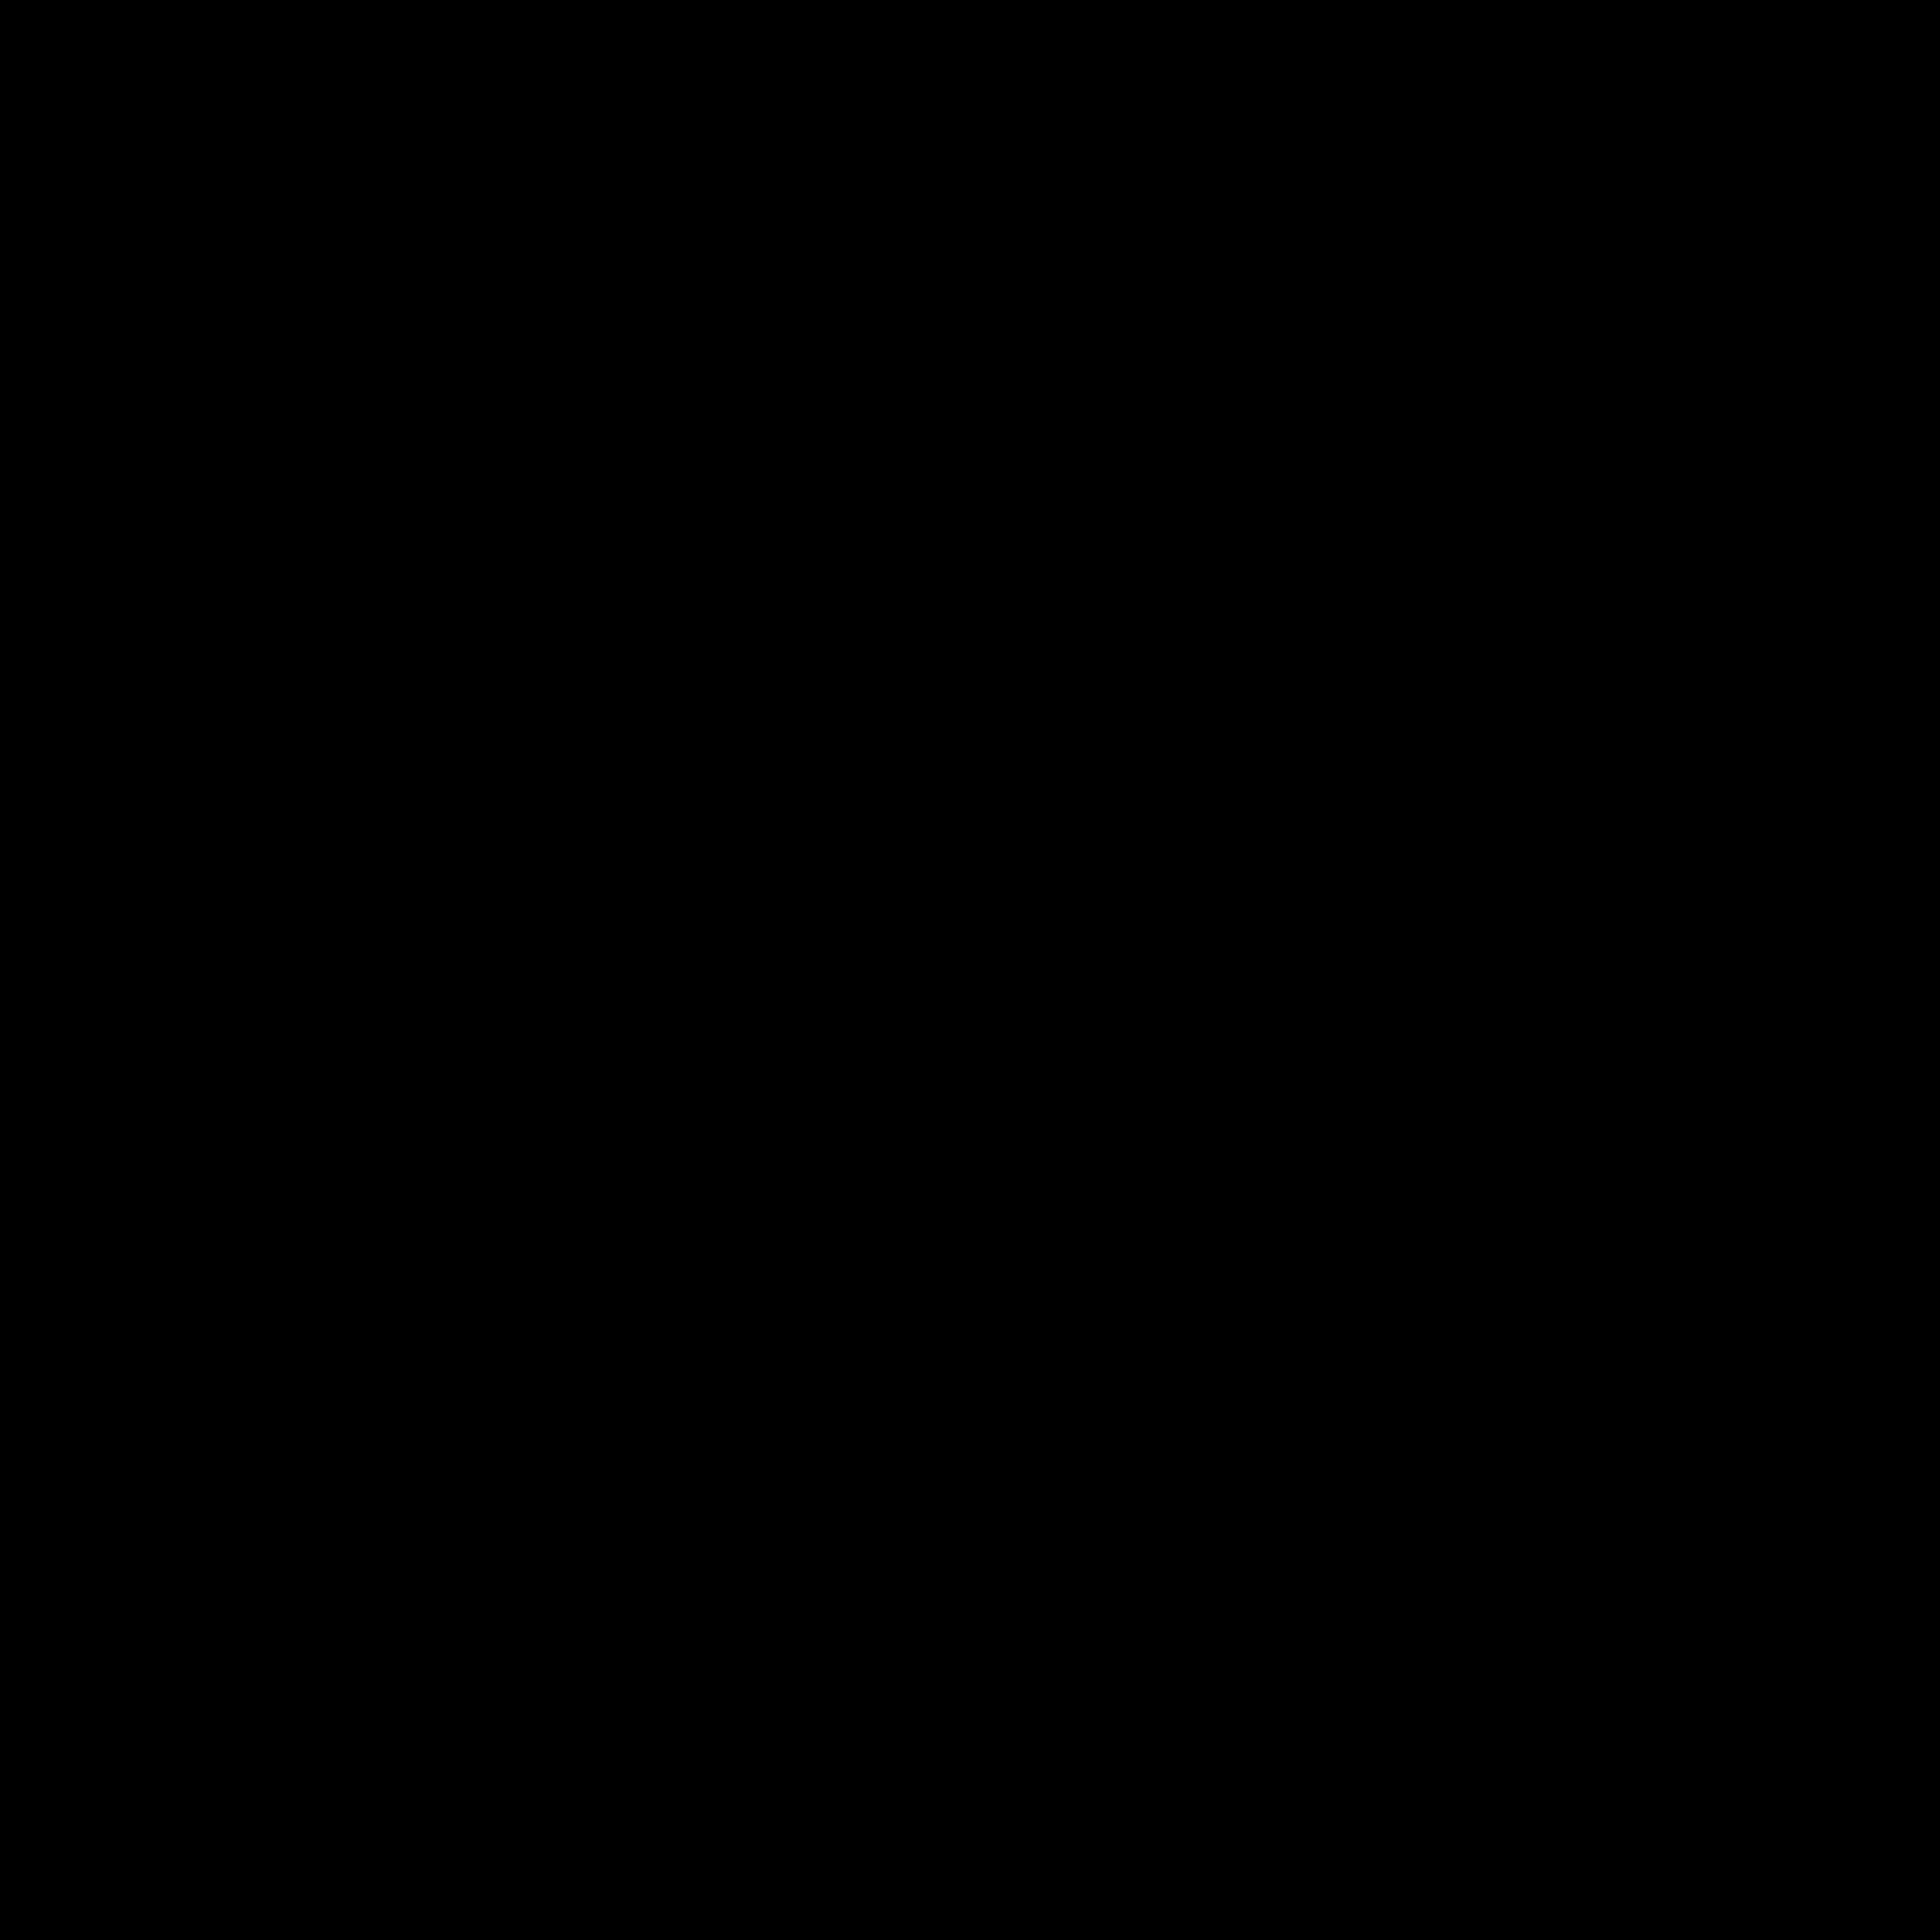 coderwall, black icon